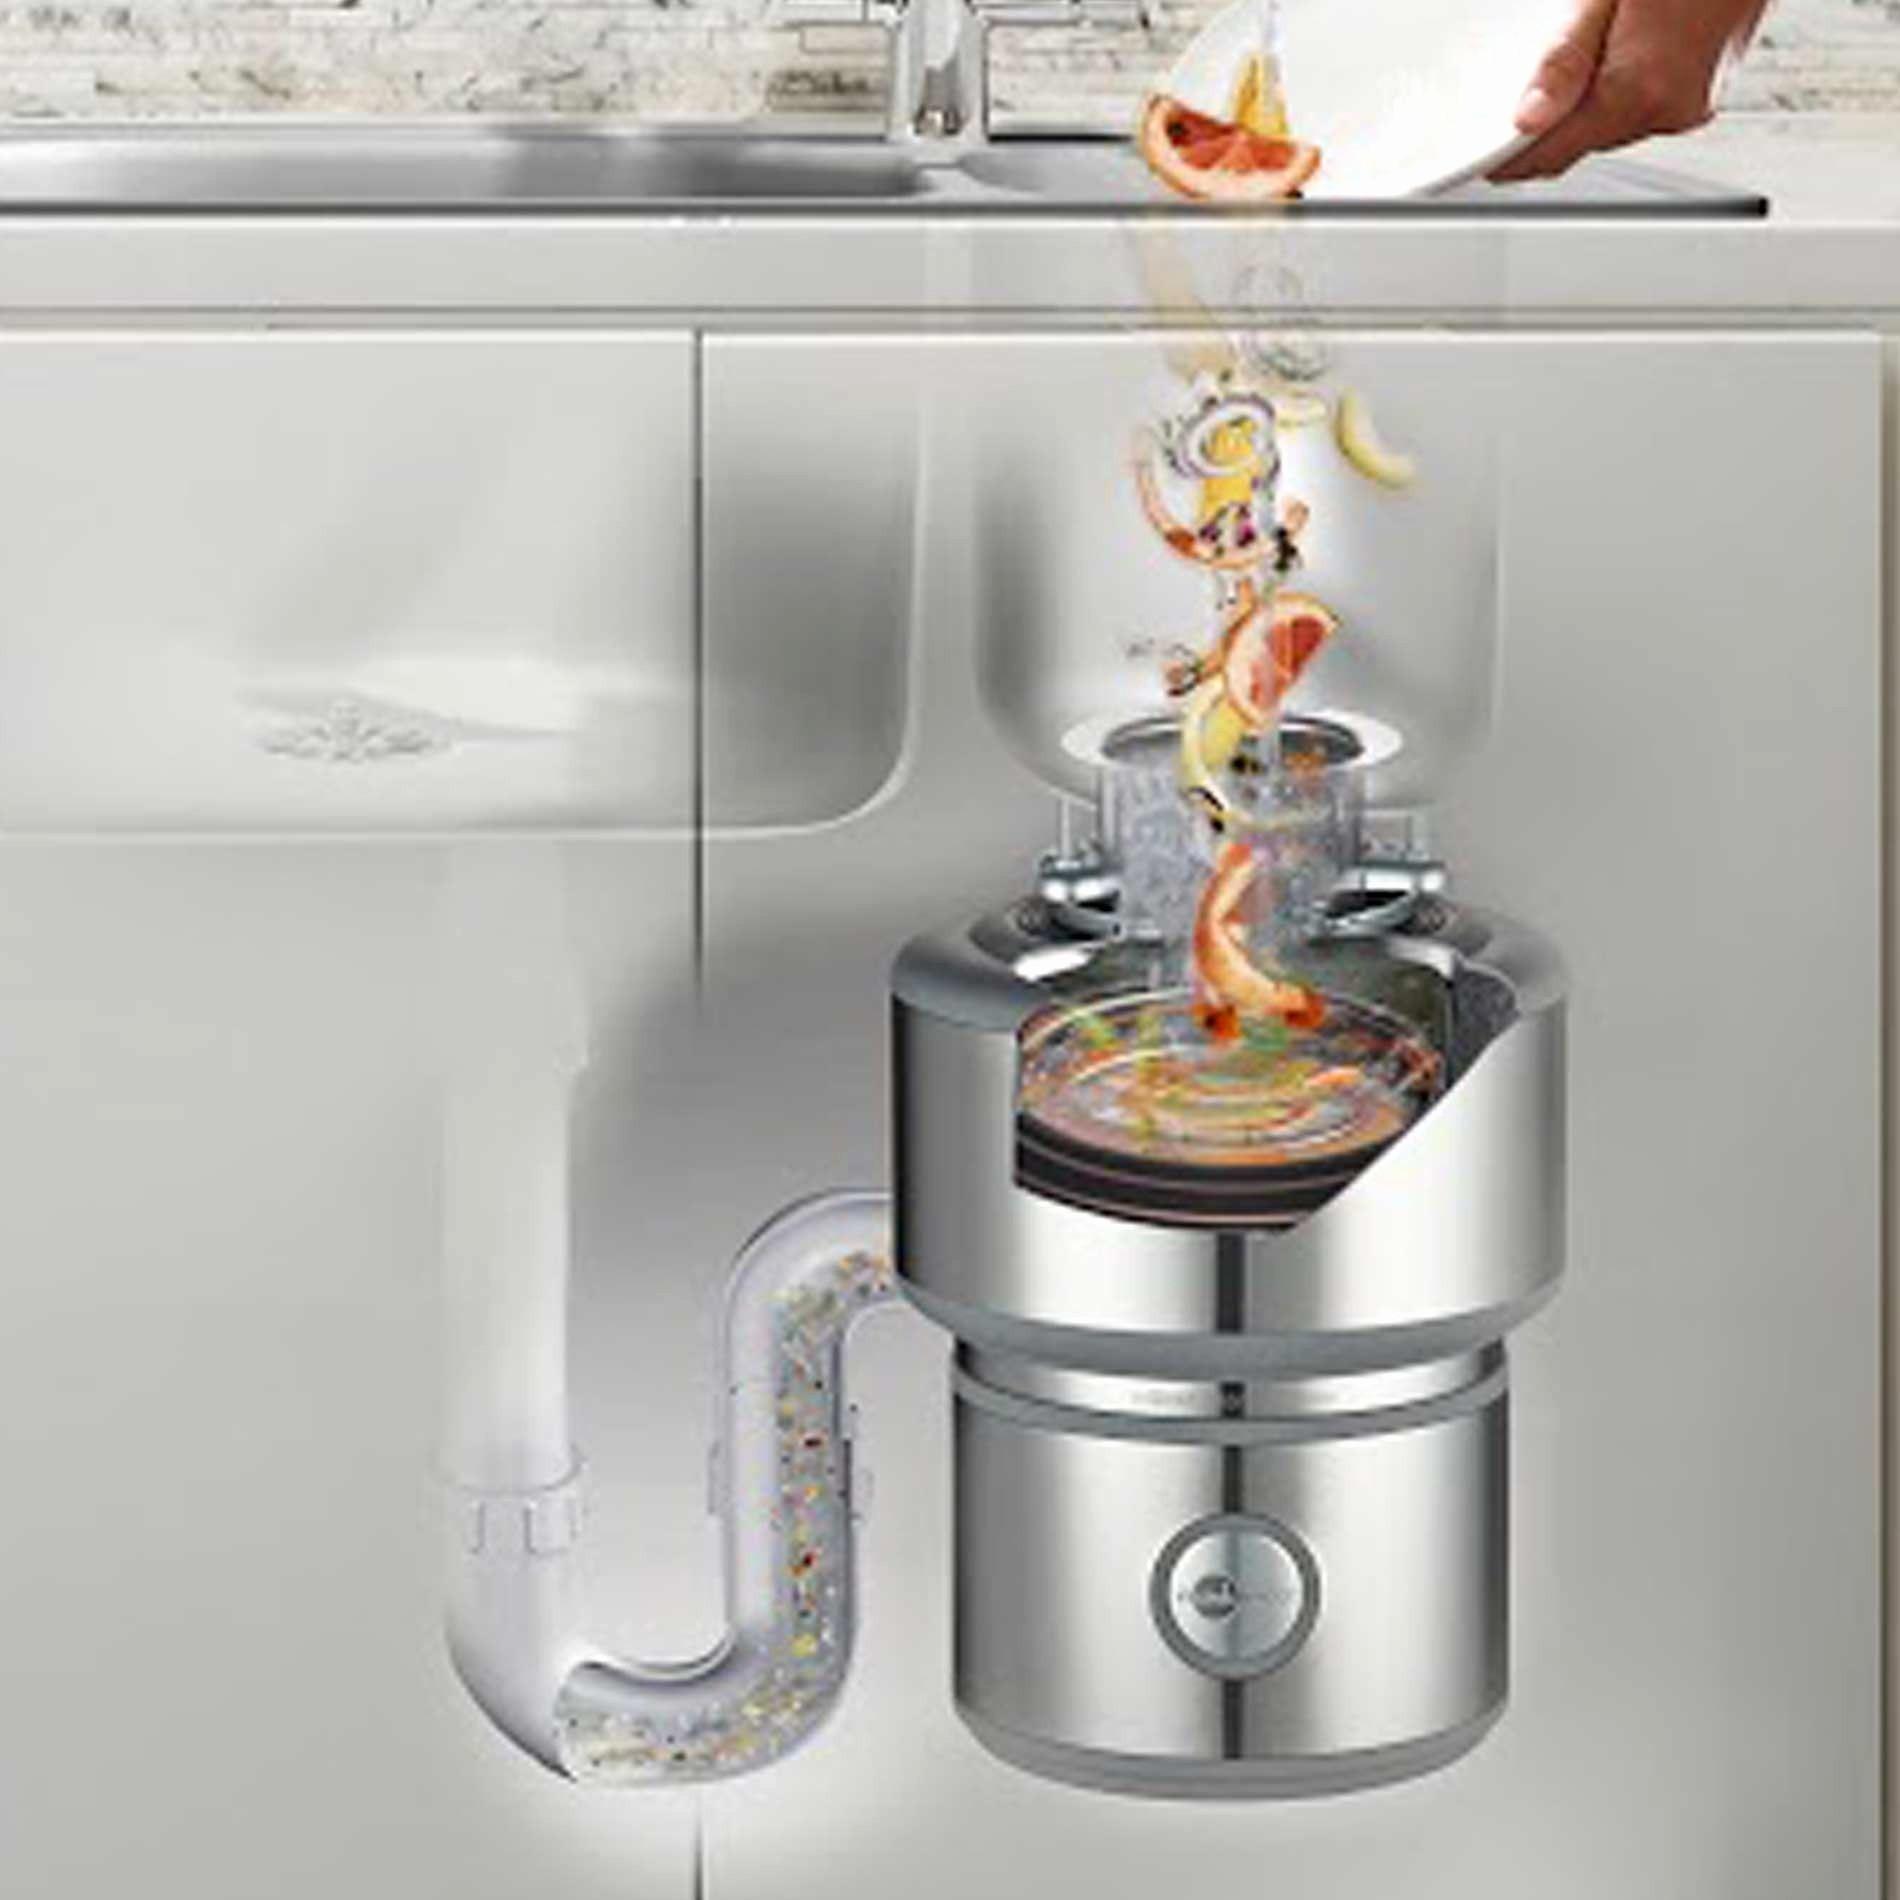 hight resolution of badger garbage disposal wiring diagram valid kitchen sink food waste garbage disposal wiring diagram